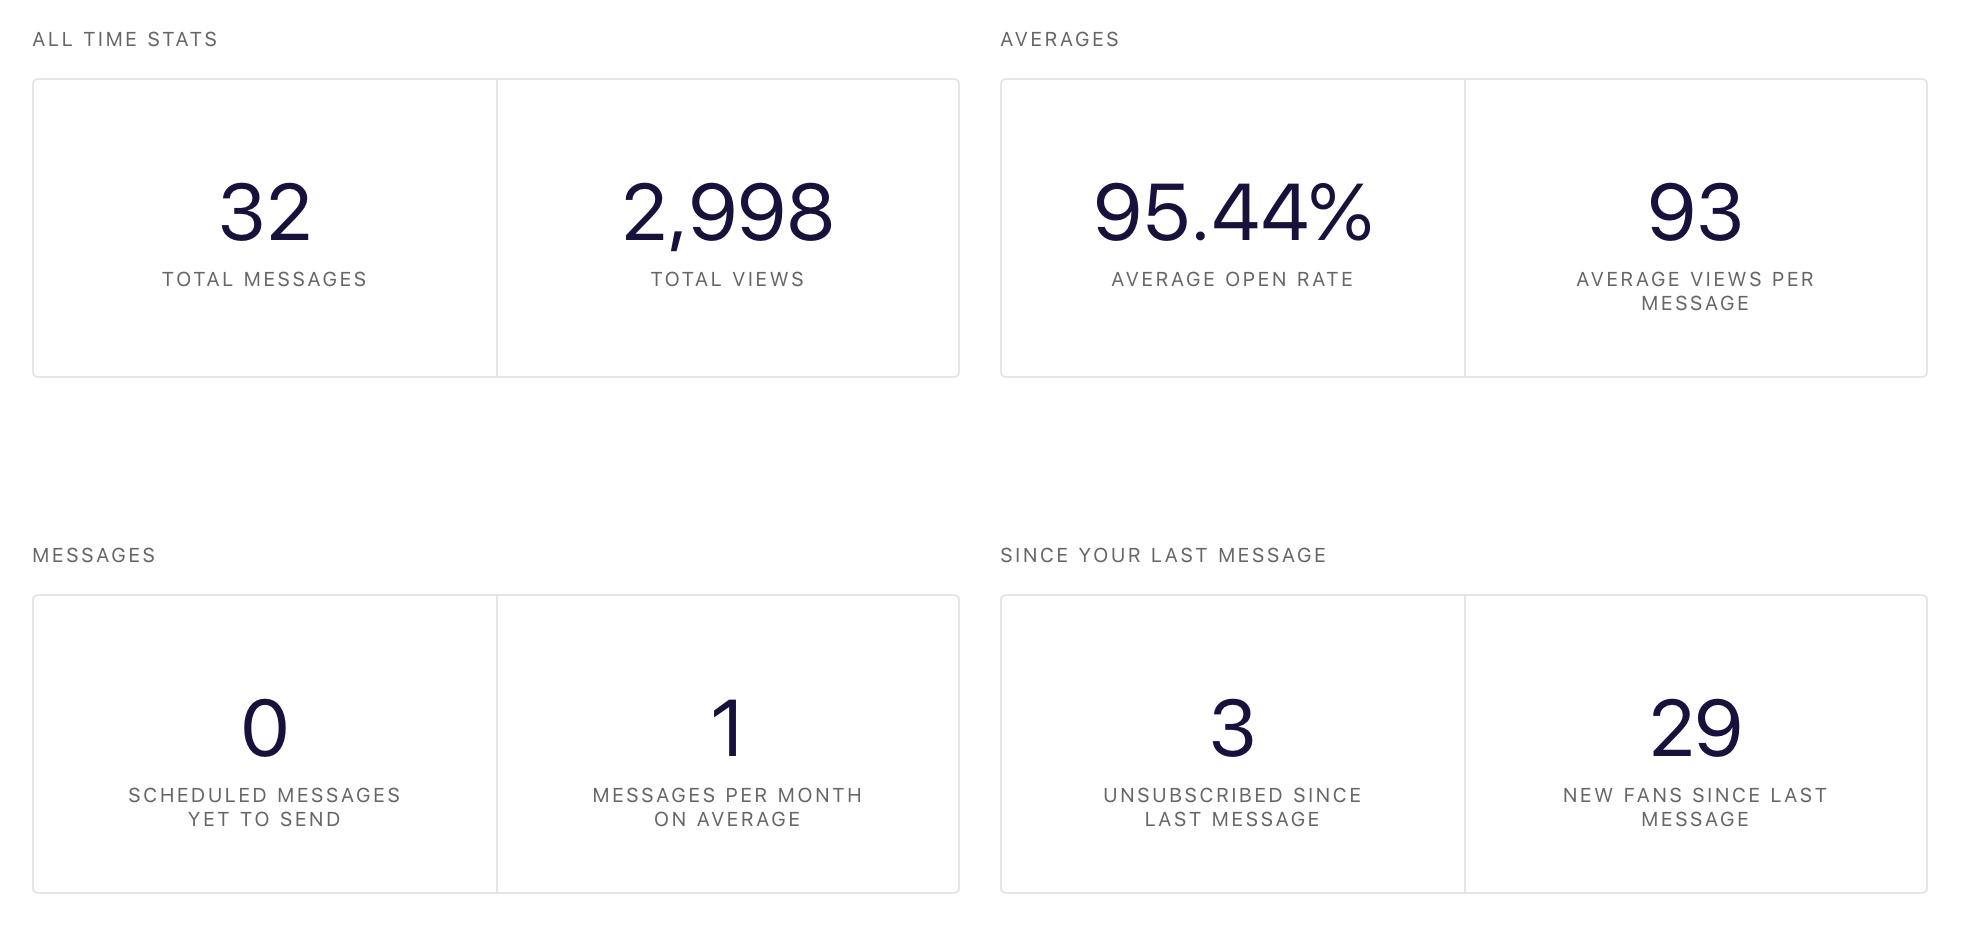 More broadcast statistics